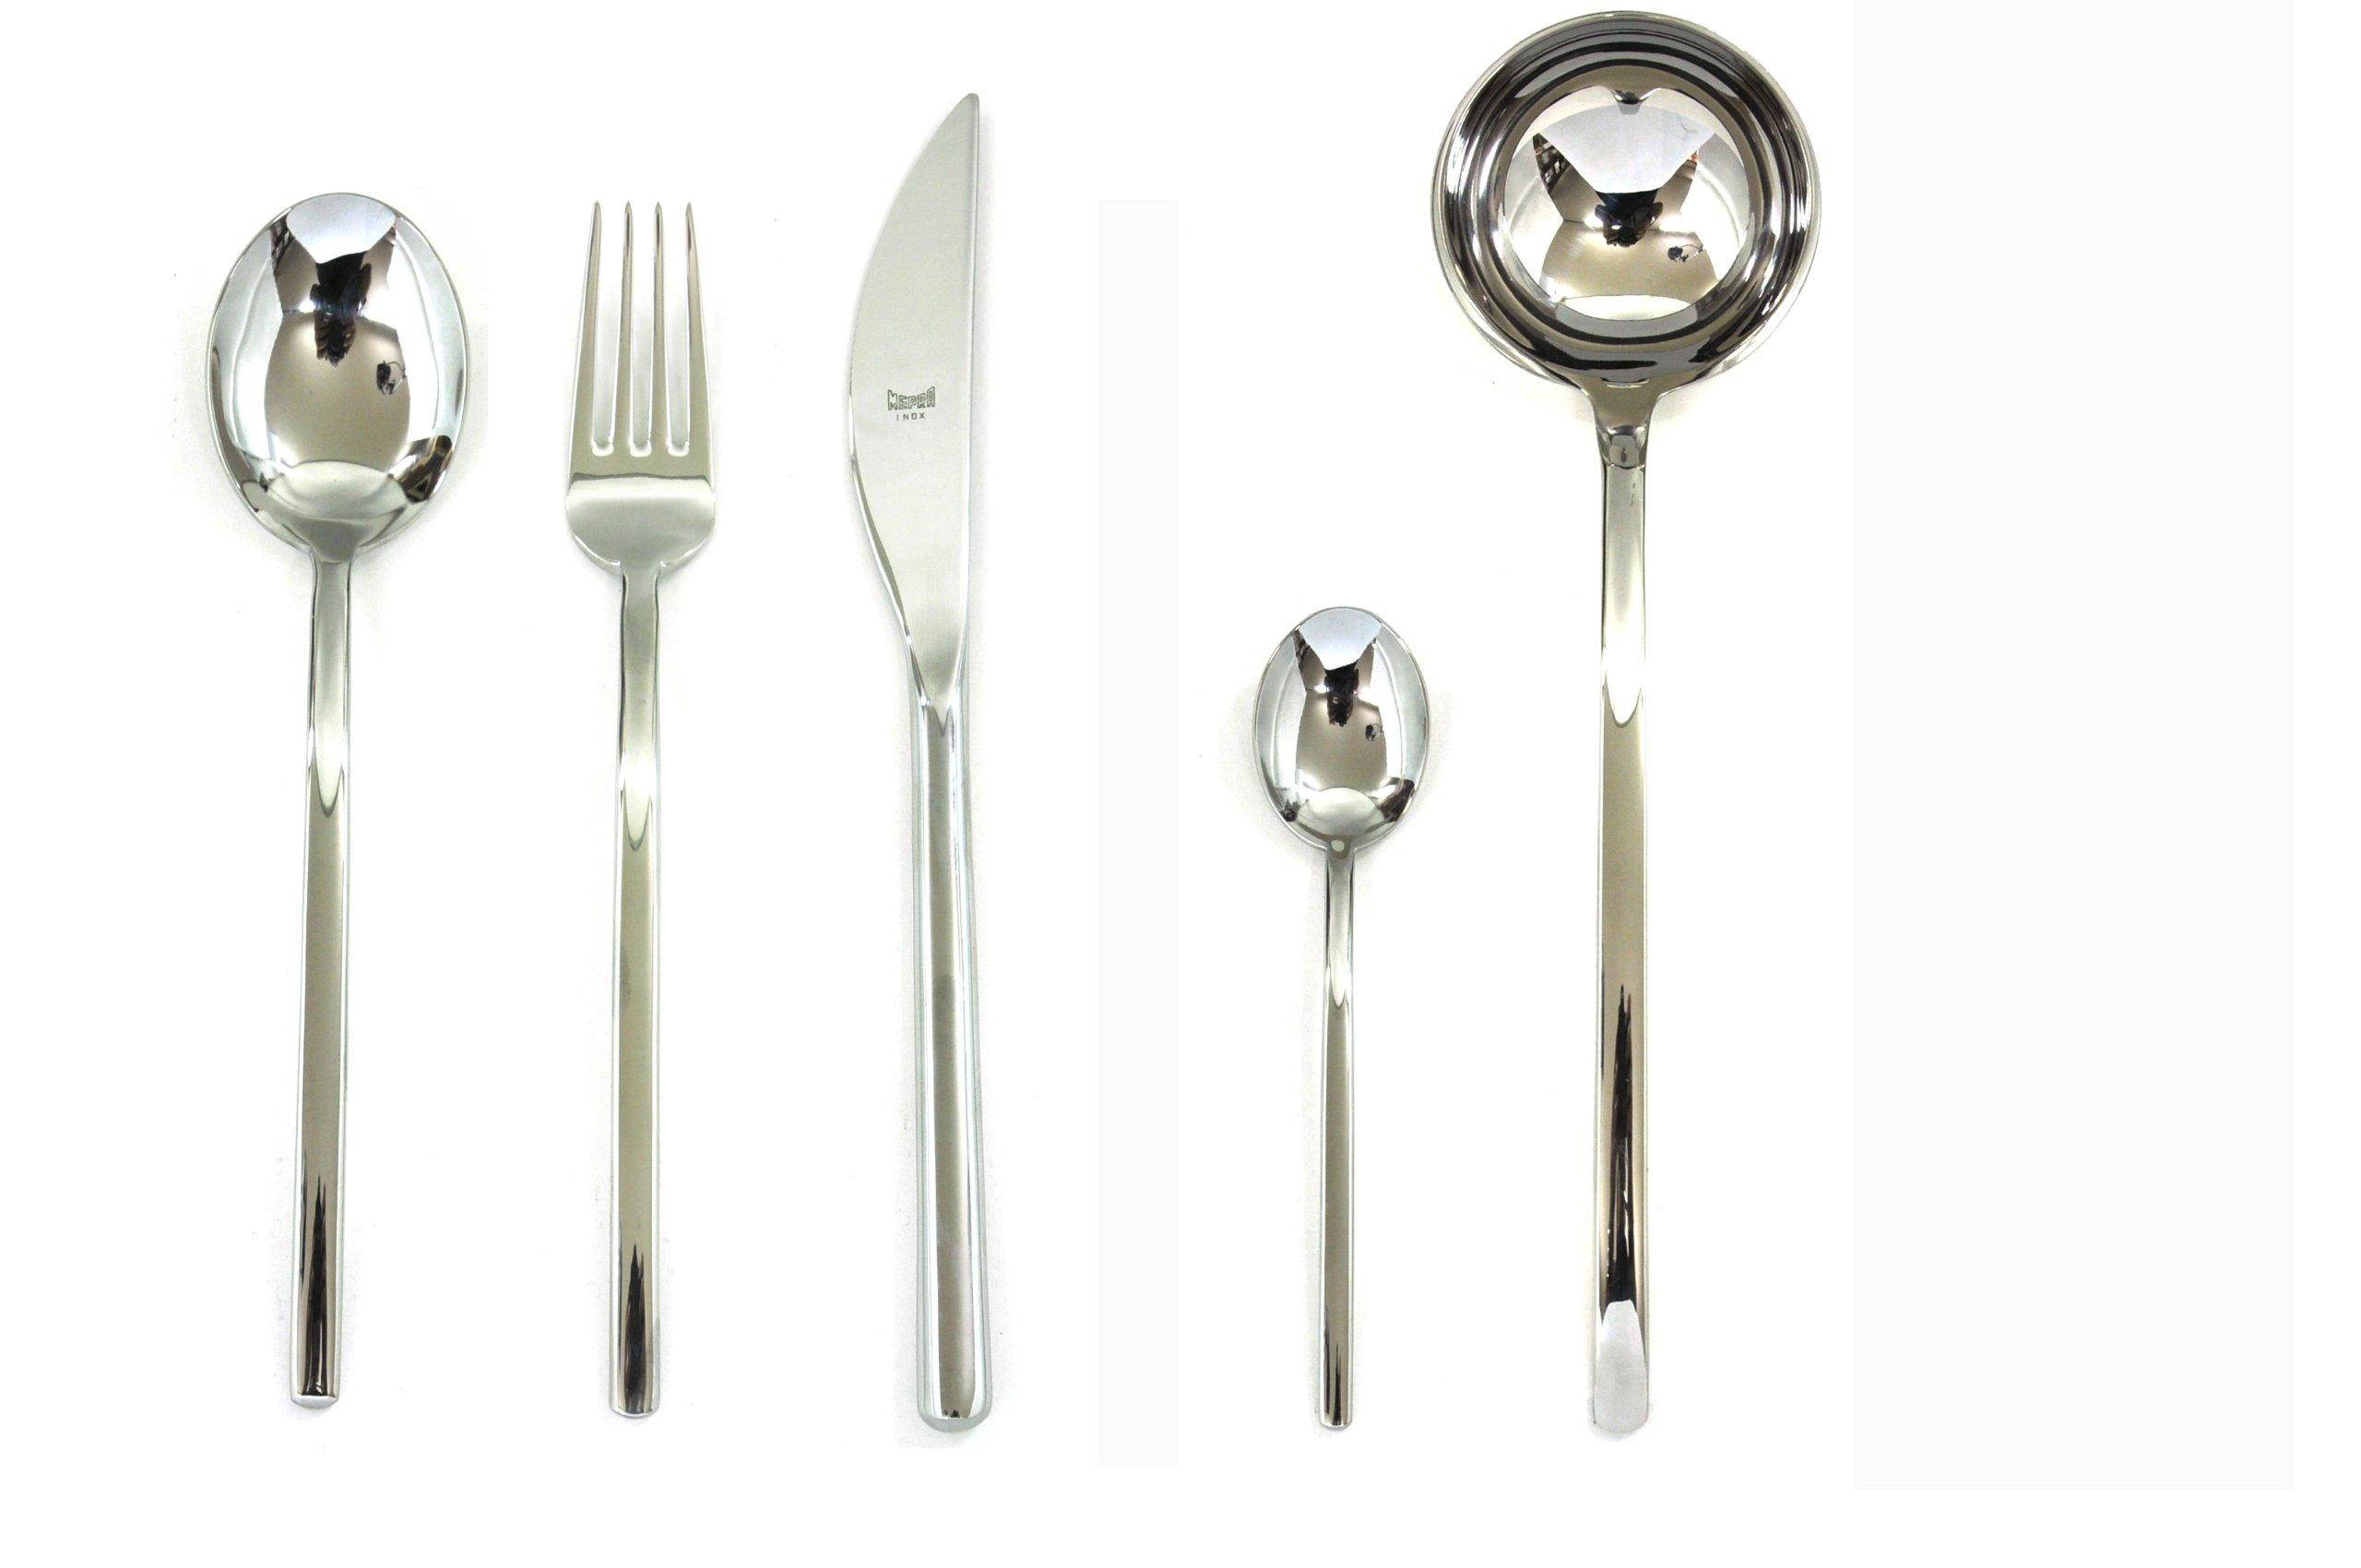 Mepra 100222049 49 Piece Sveva Cutlery Set, Stainless Steel